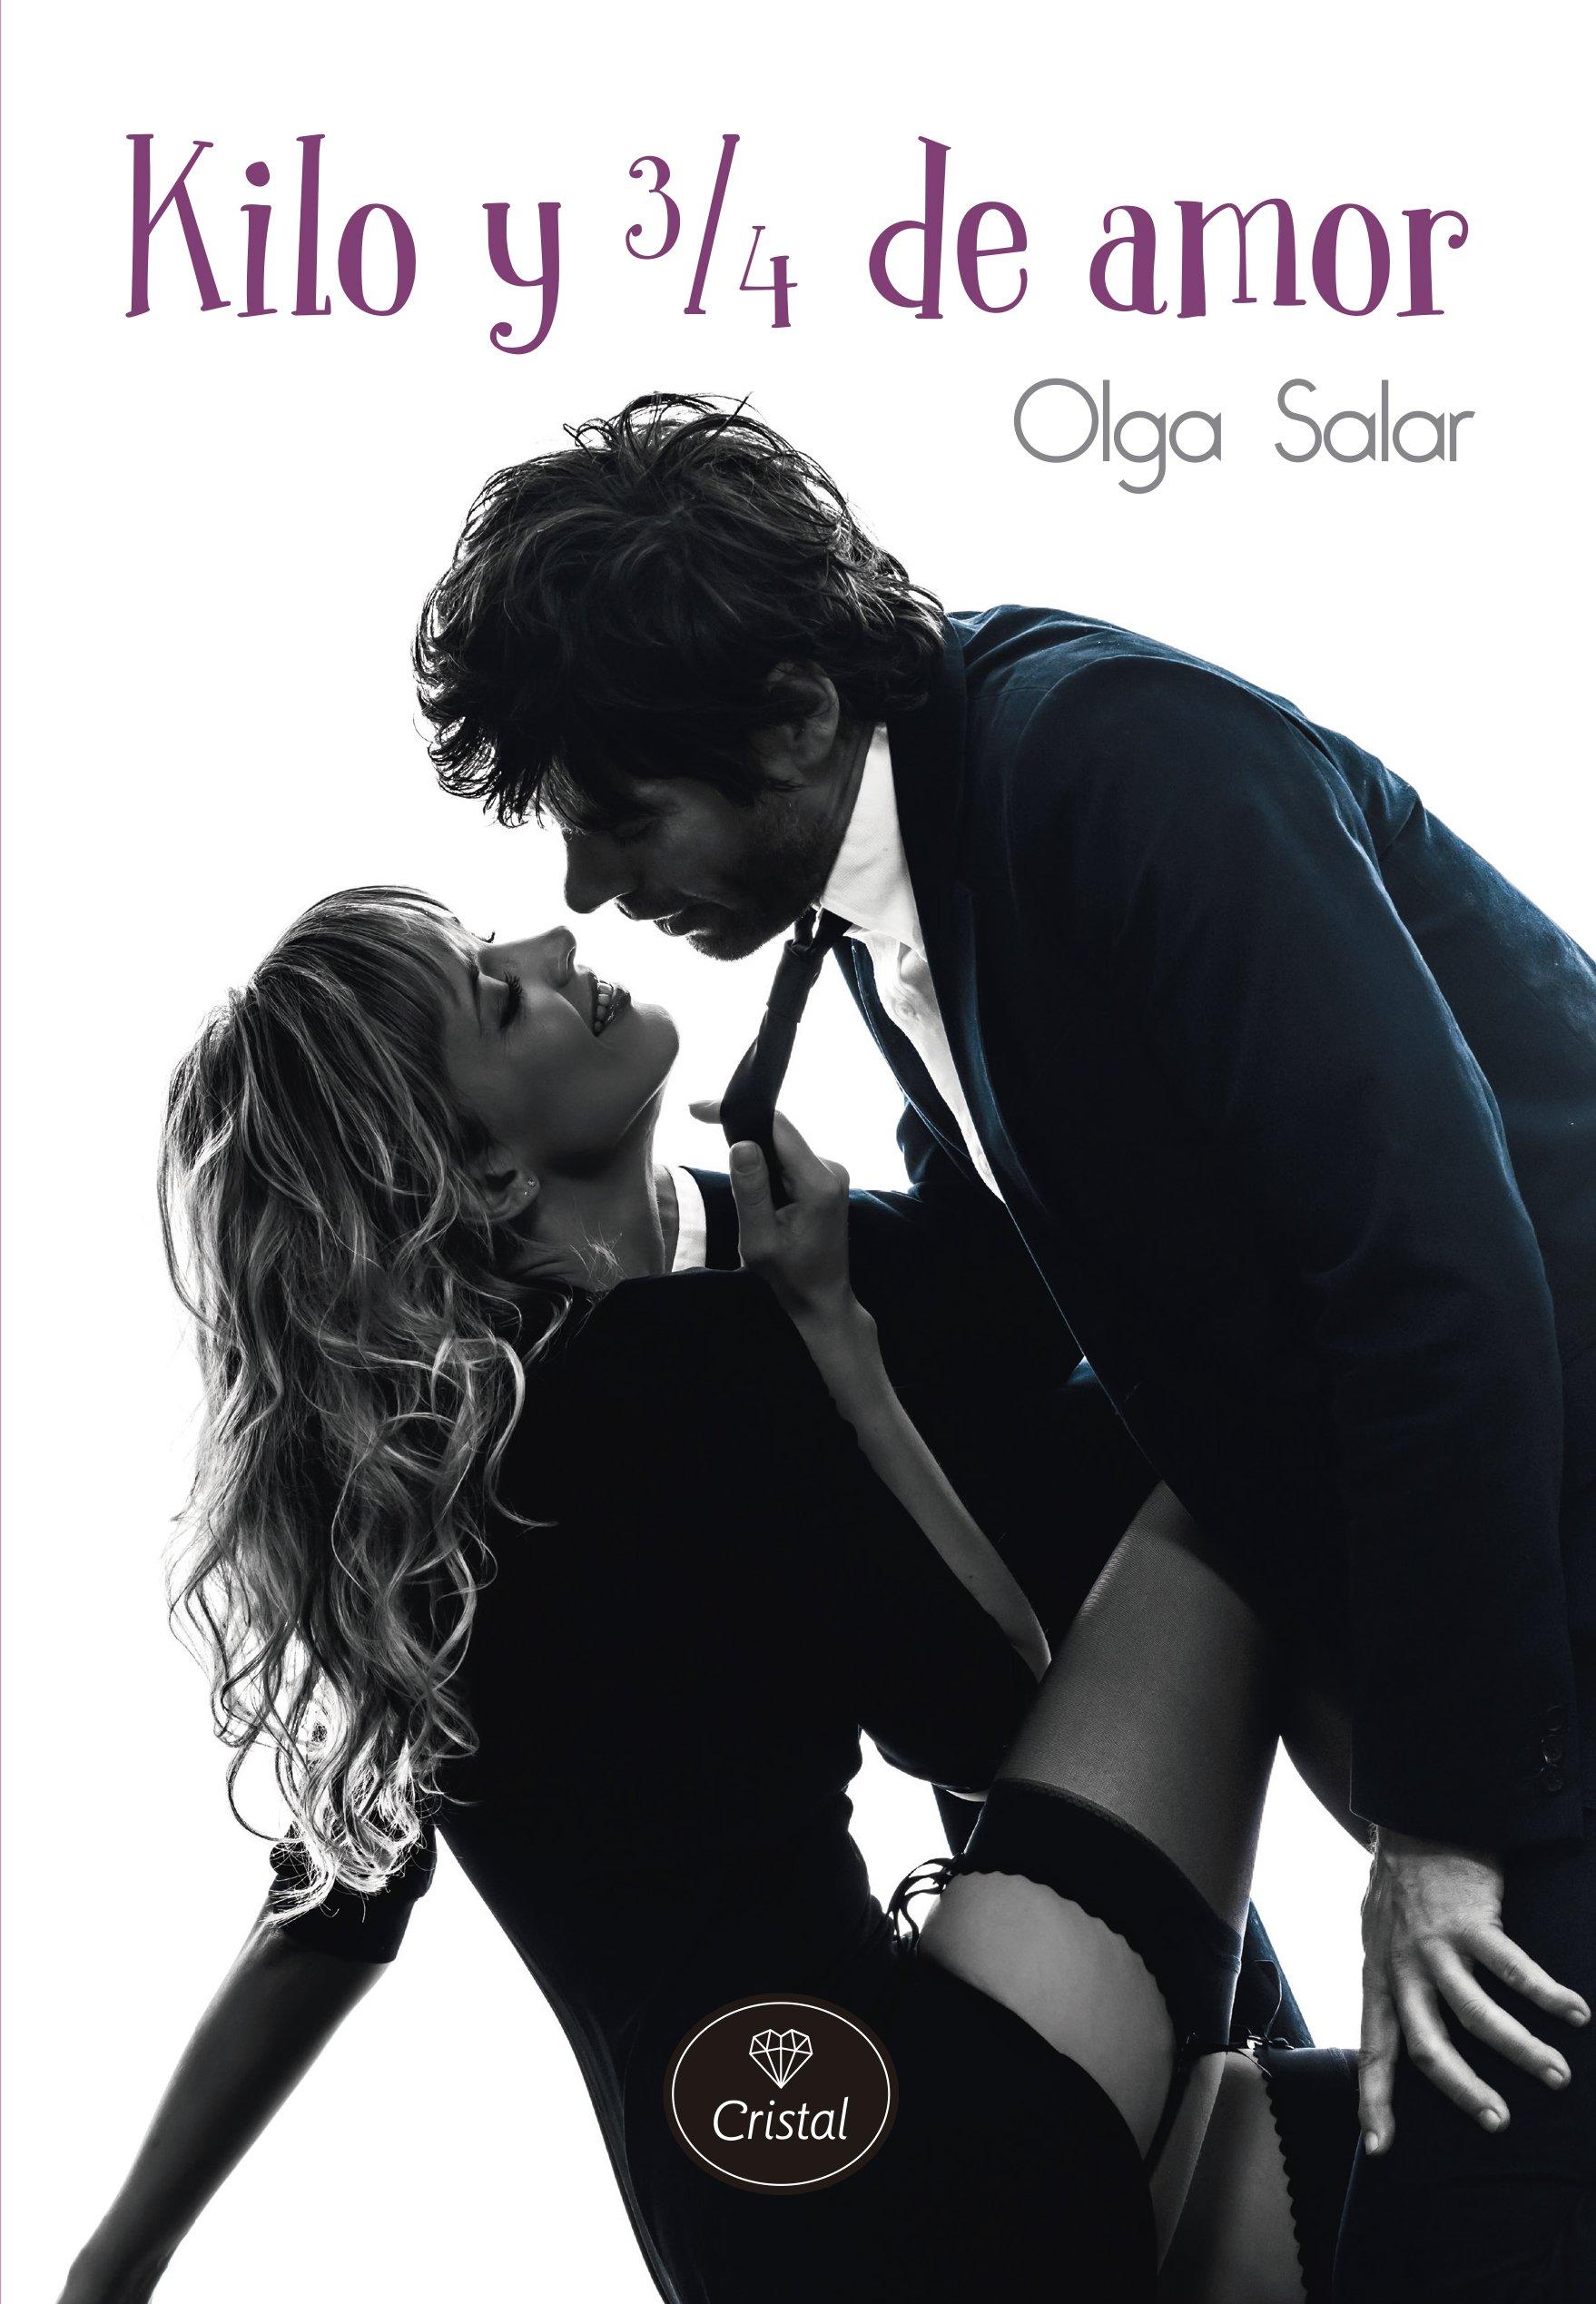 Un kilo y 3/4 de amor: Olga Salar Carrera: 9788415611387: Amazon.com: Books